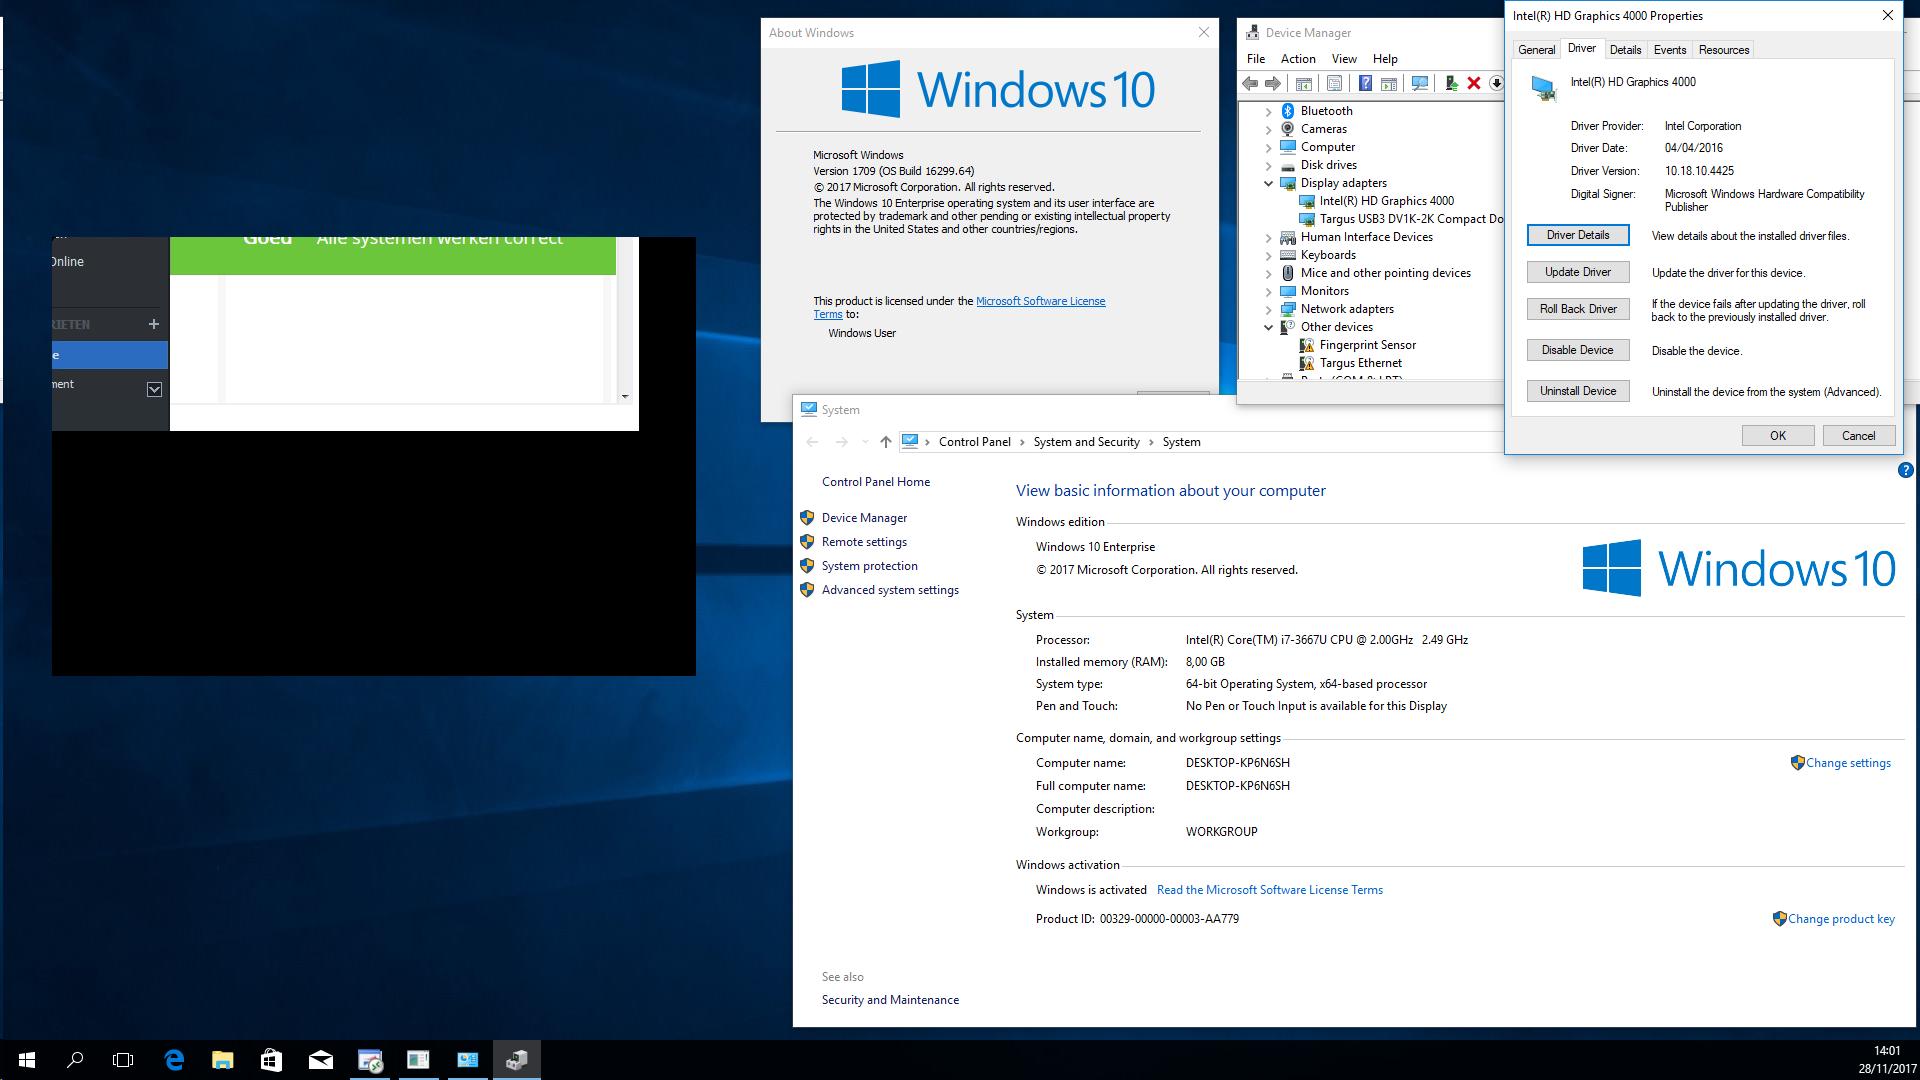 Windows 10 1709] Issues when maximizing RDP App